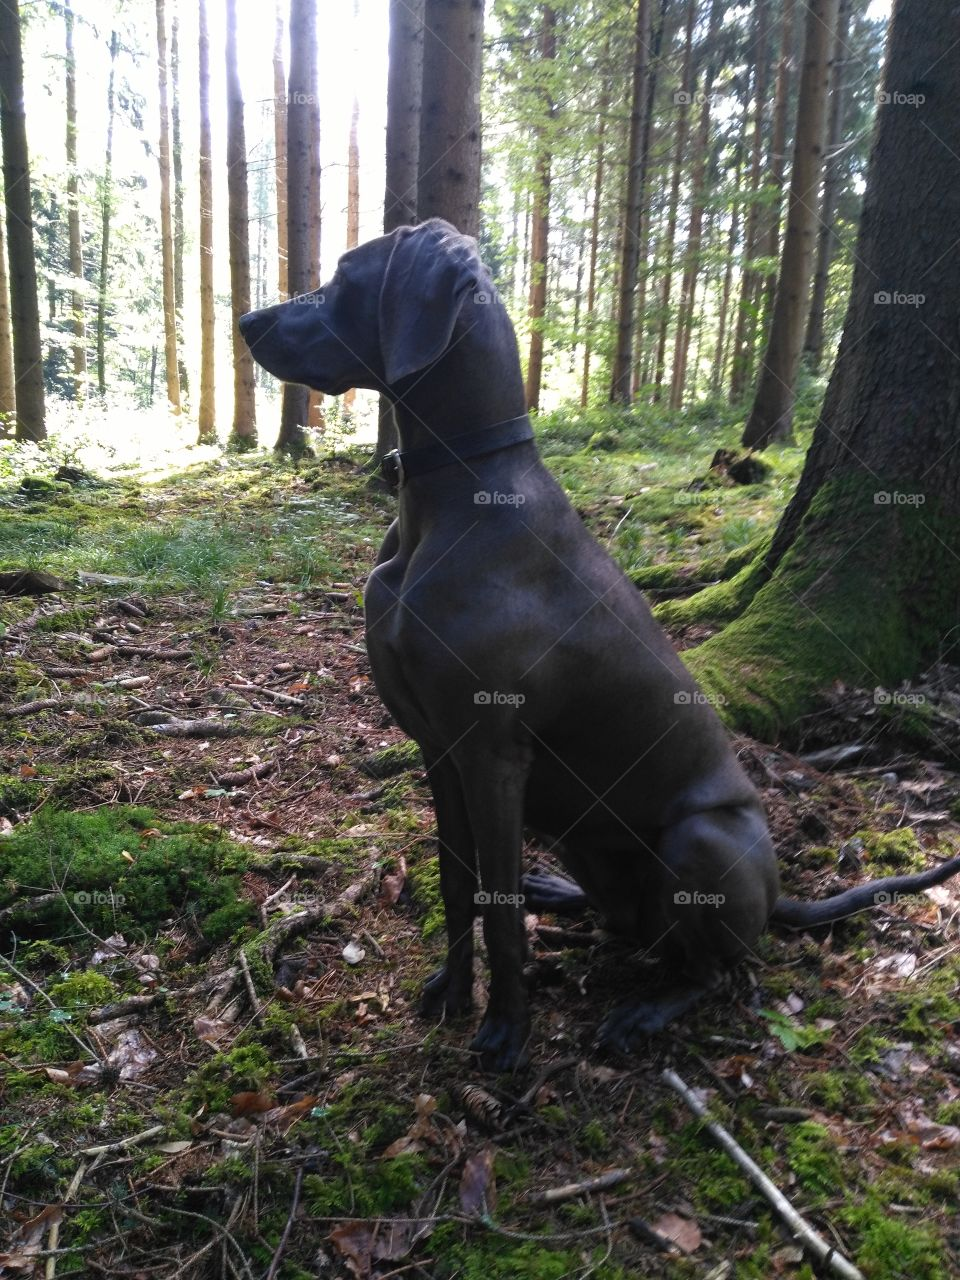 Weimaraner in the forest